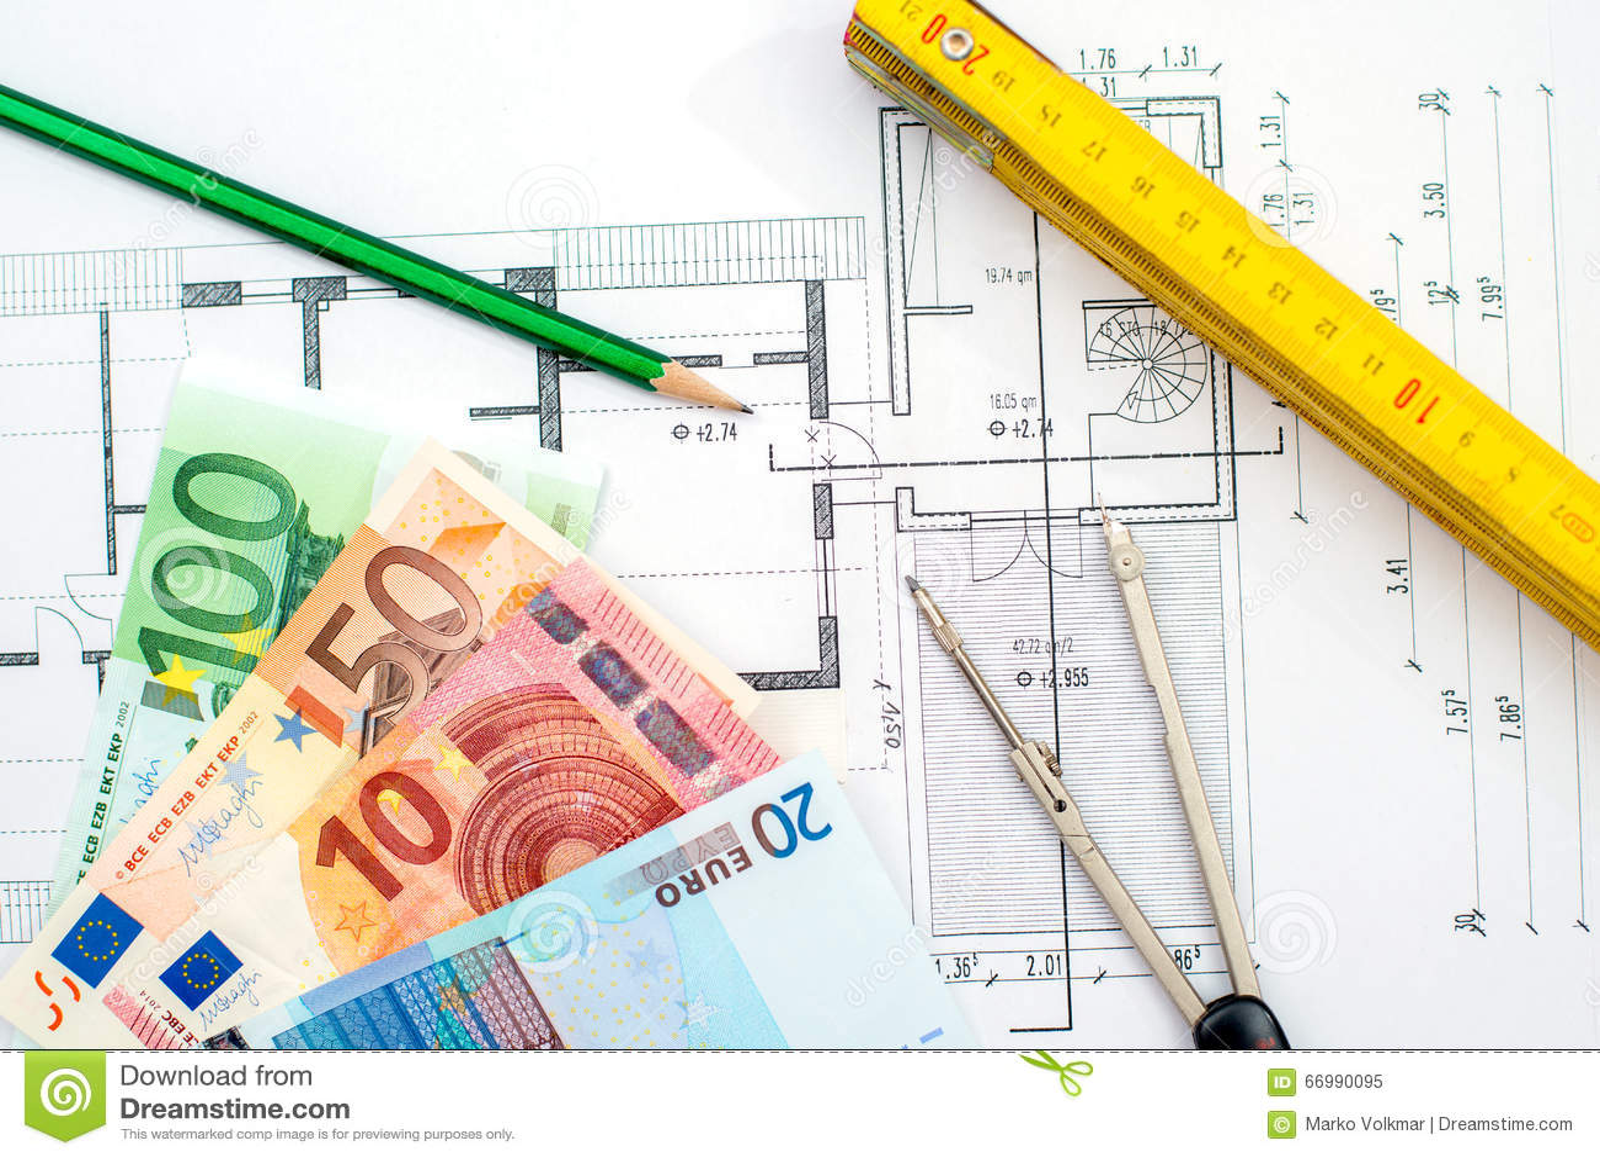 Bauplan Mit Fabulous Spanisch Prospekt Xxl Nord Holz